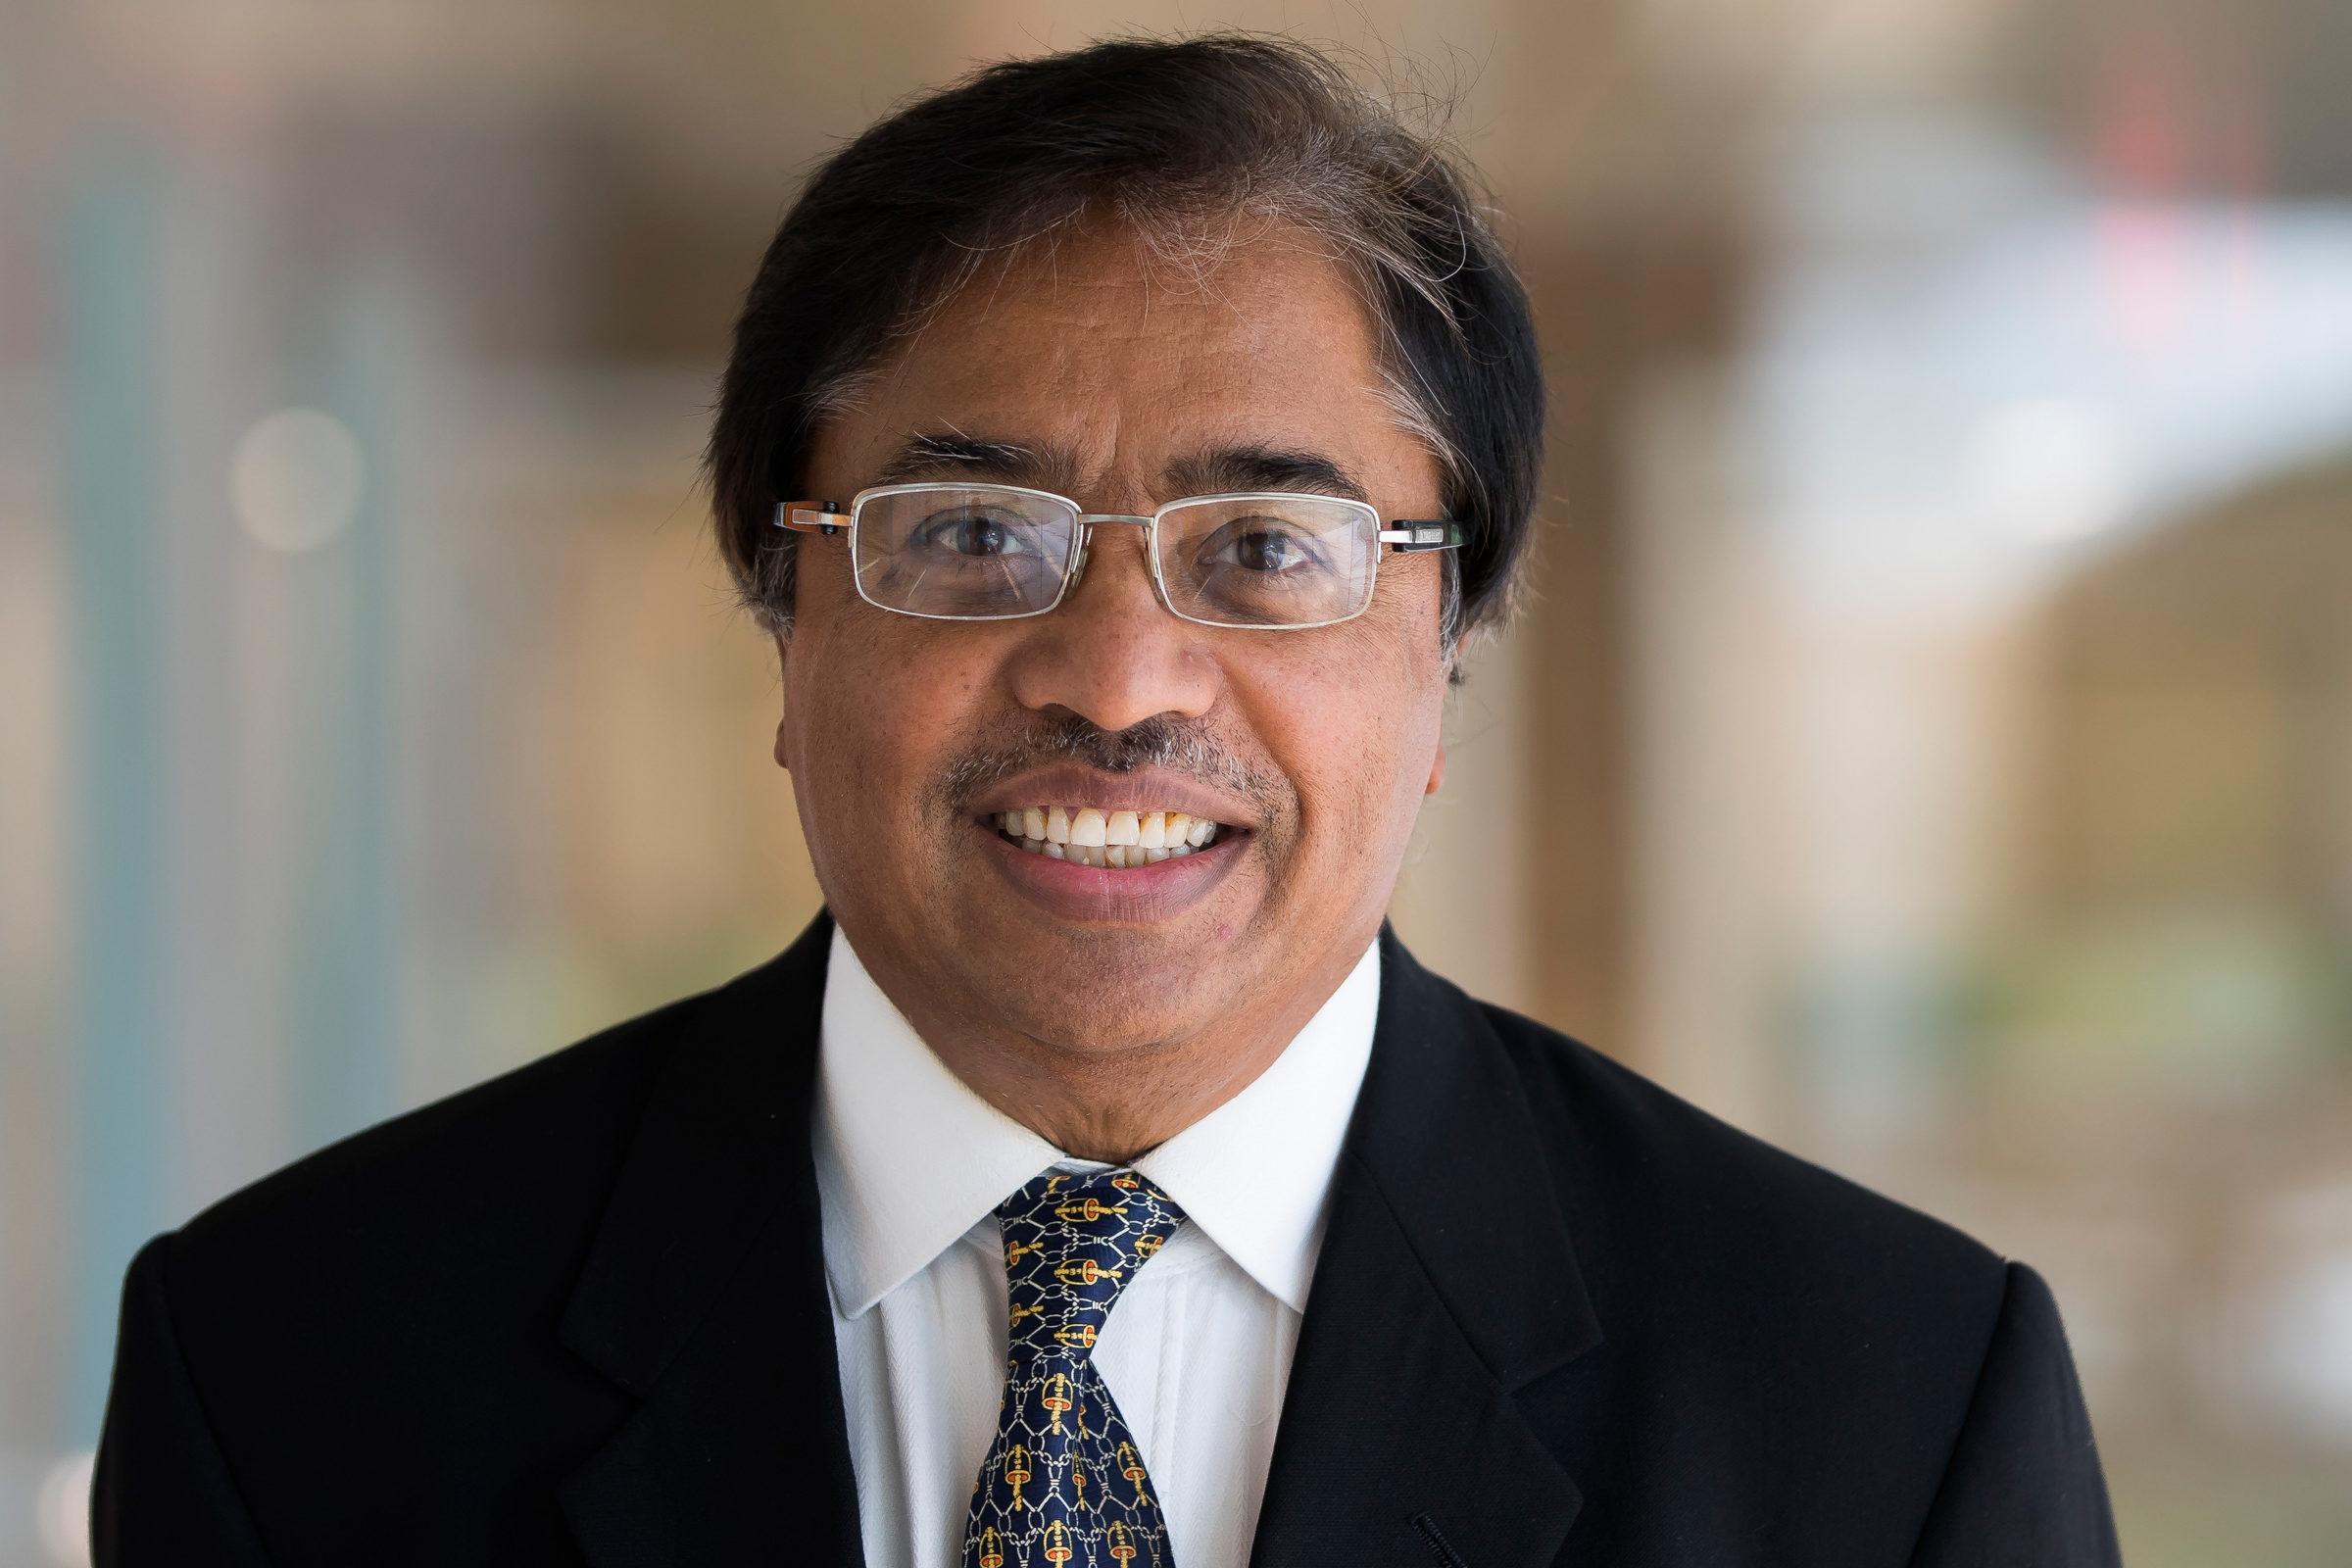 EECS-CSE professor Pinaki Mazumder. Photo: Joseph Xu